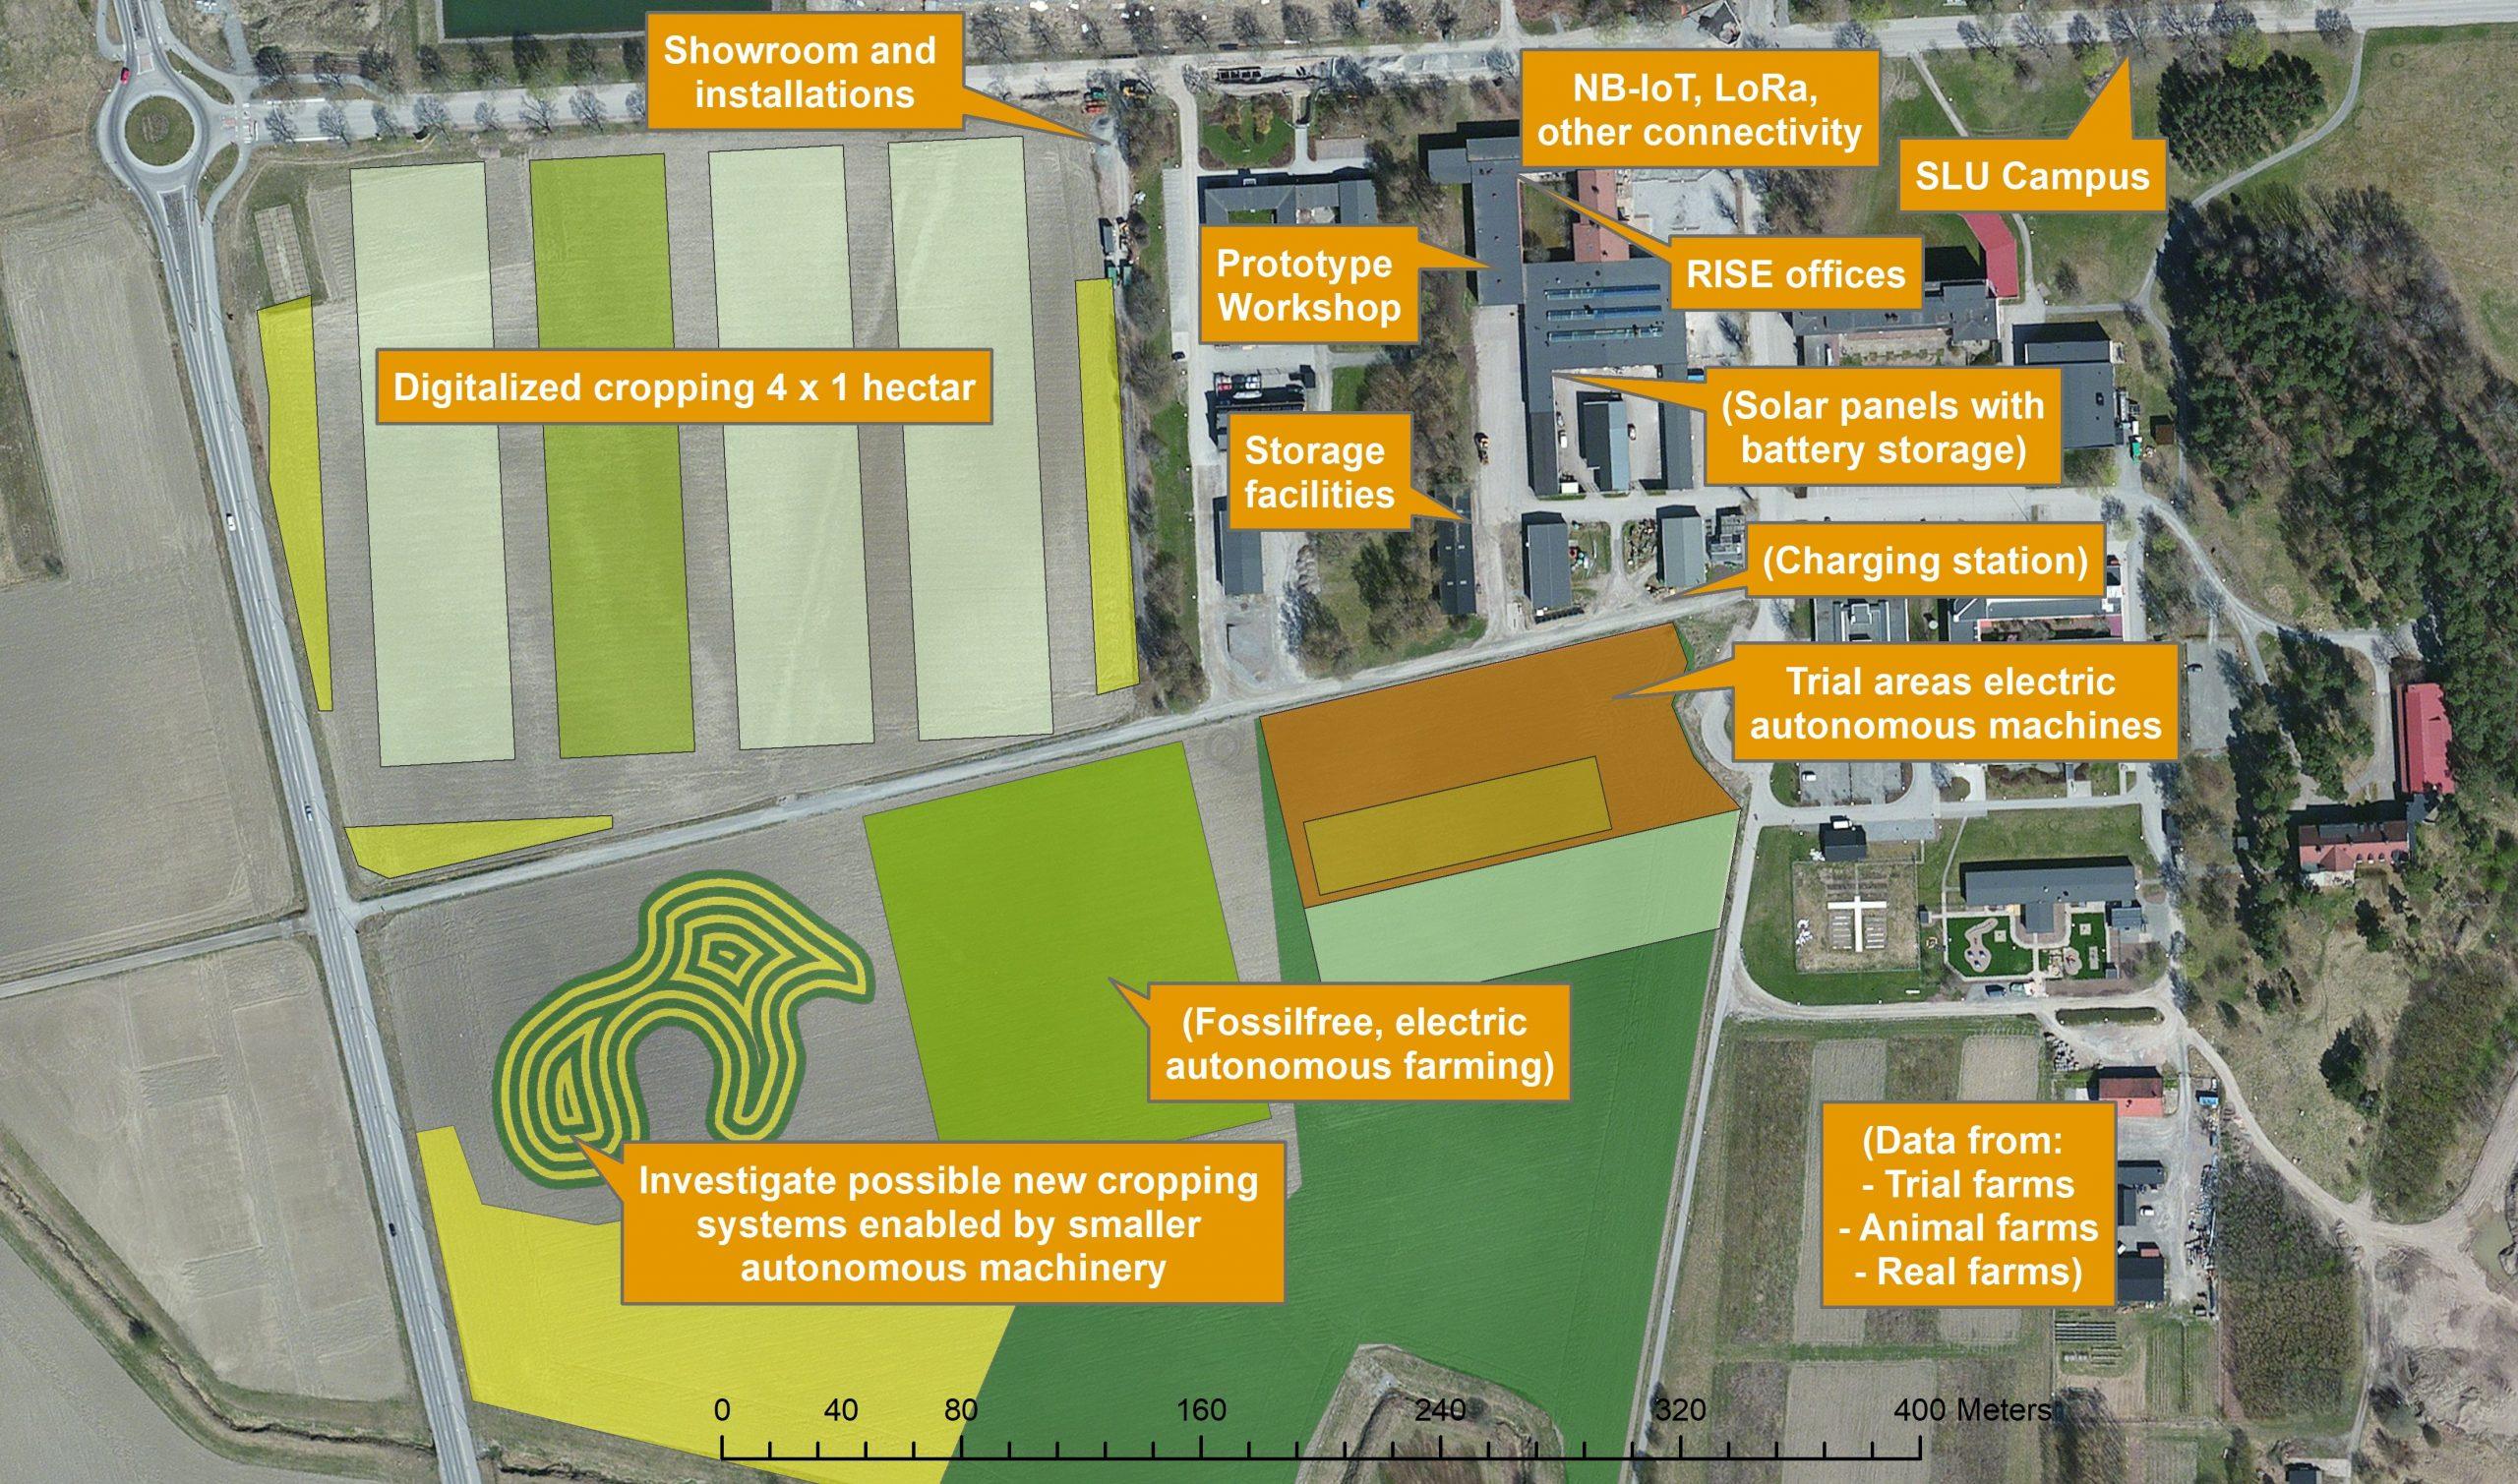 Satellite map of Testbed facilities at SLU campus. Photo.